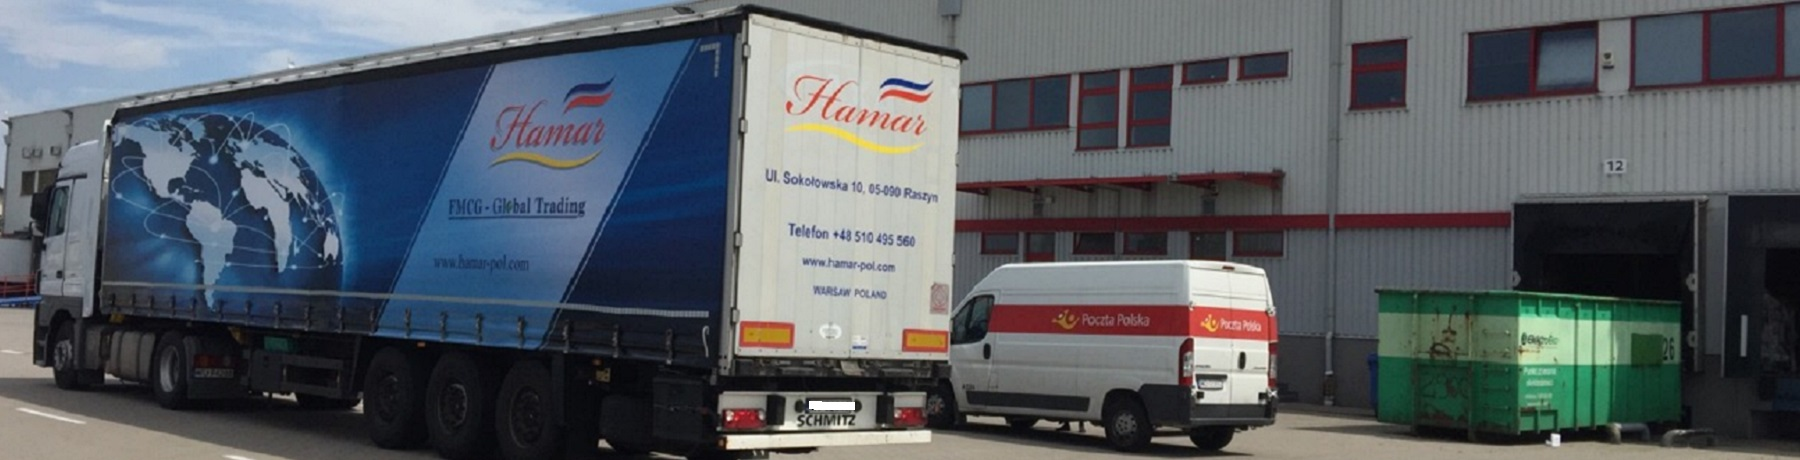 truck-2-image